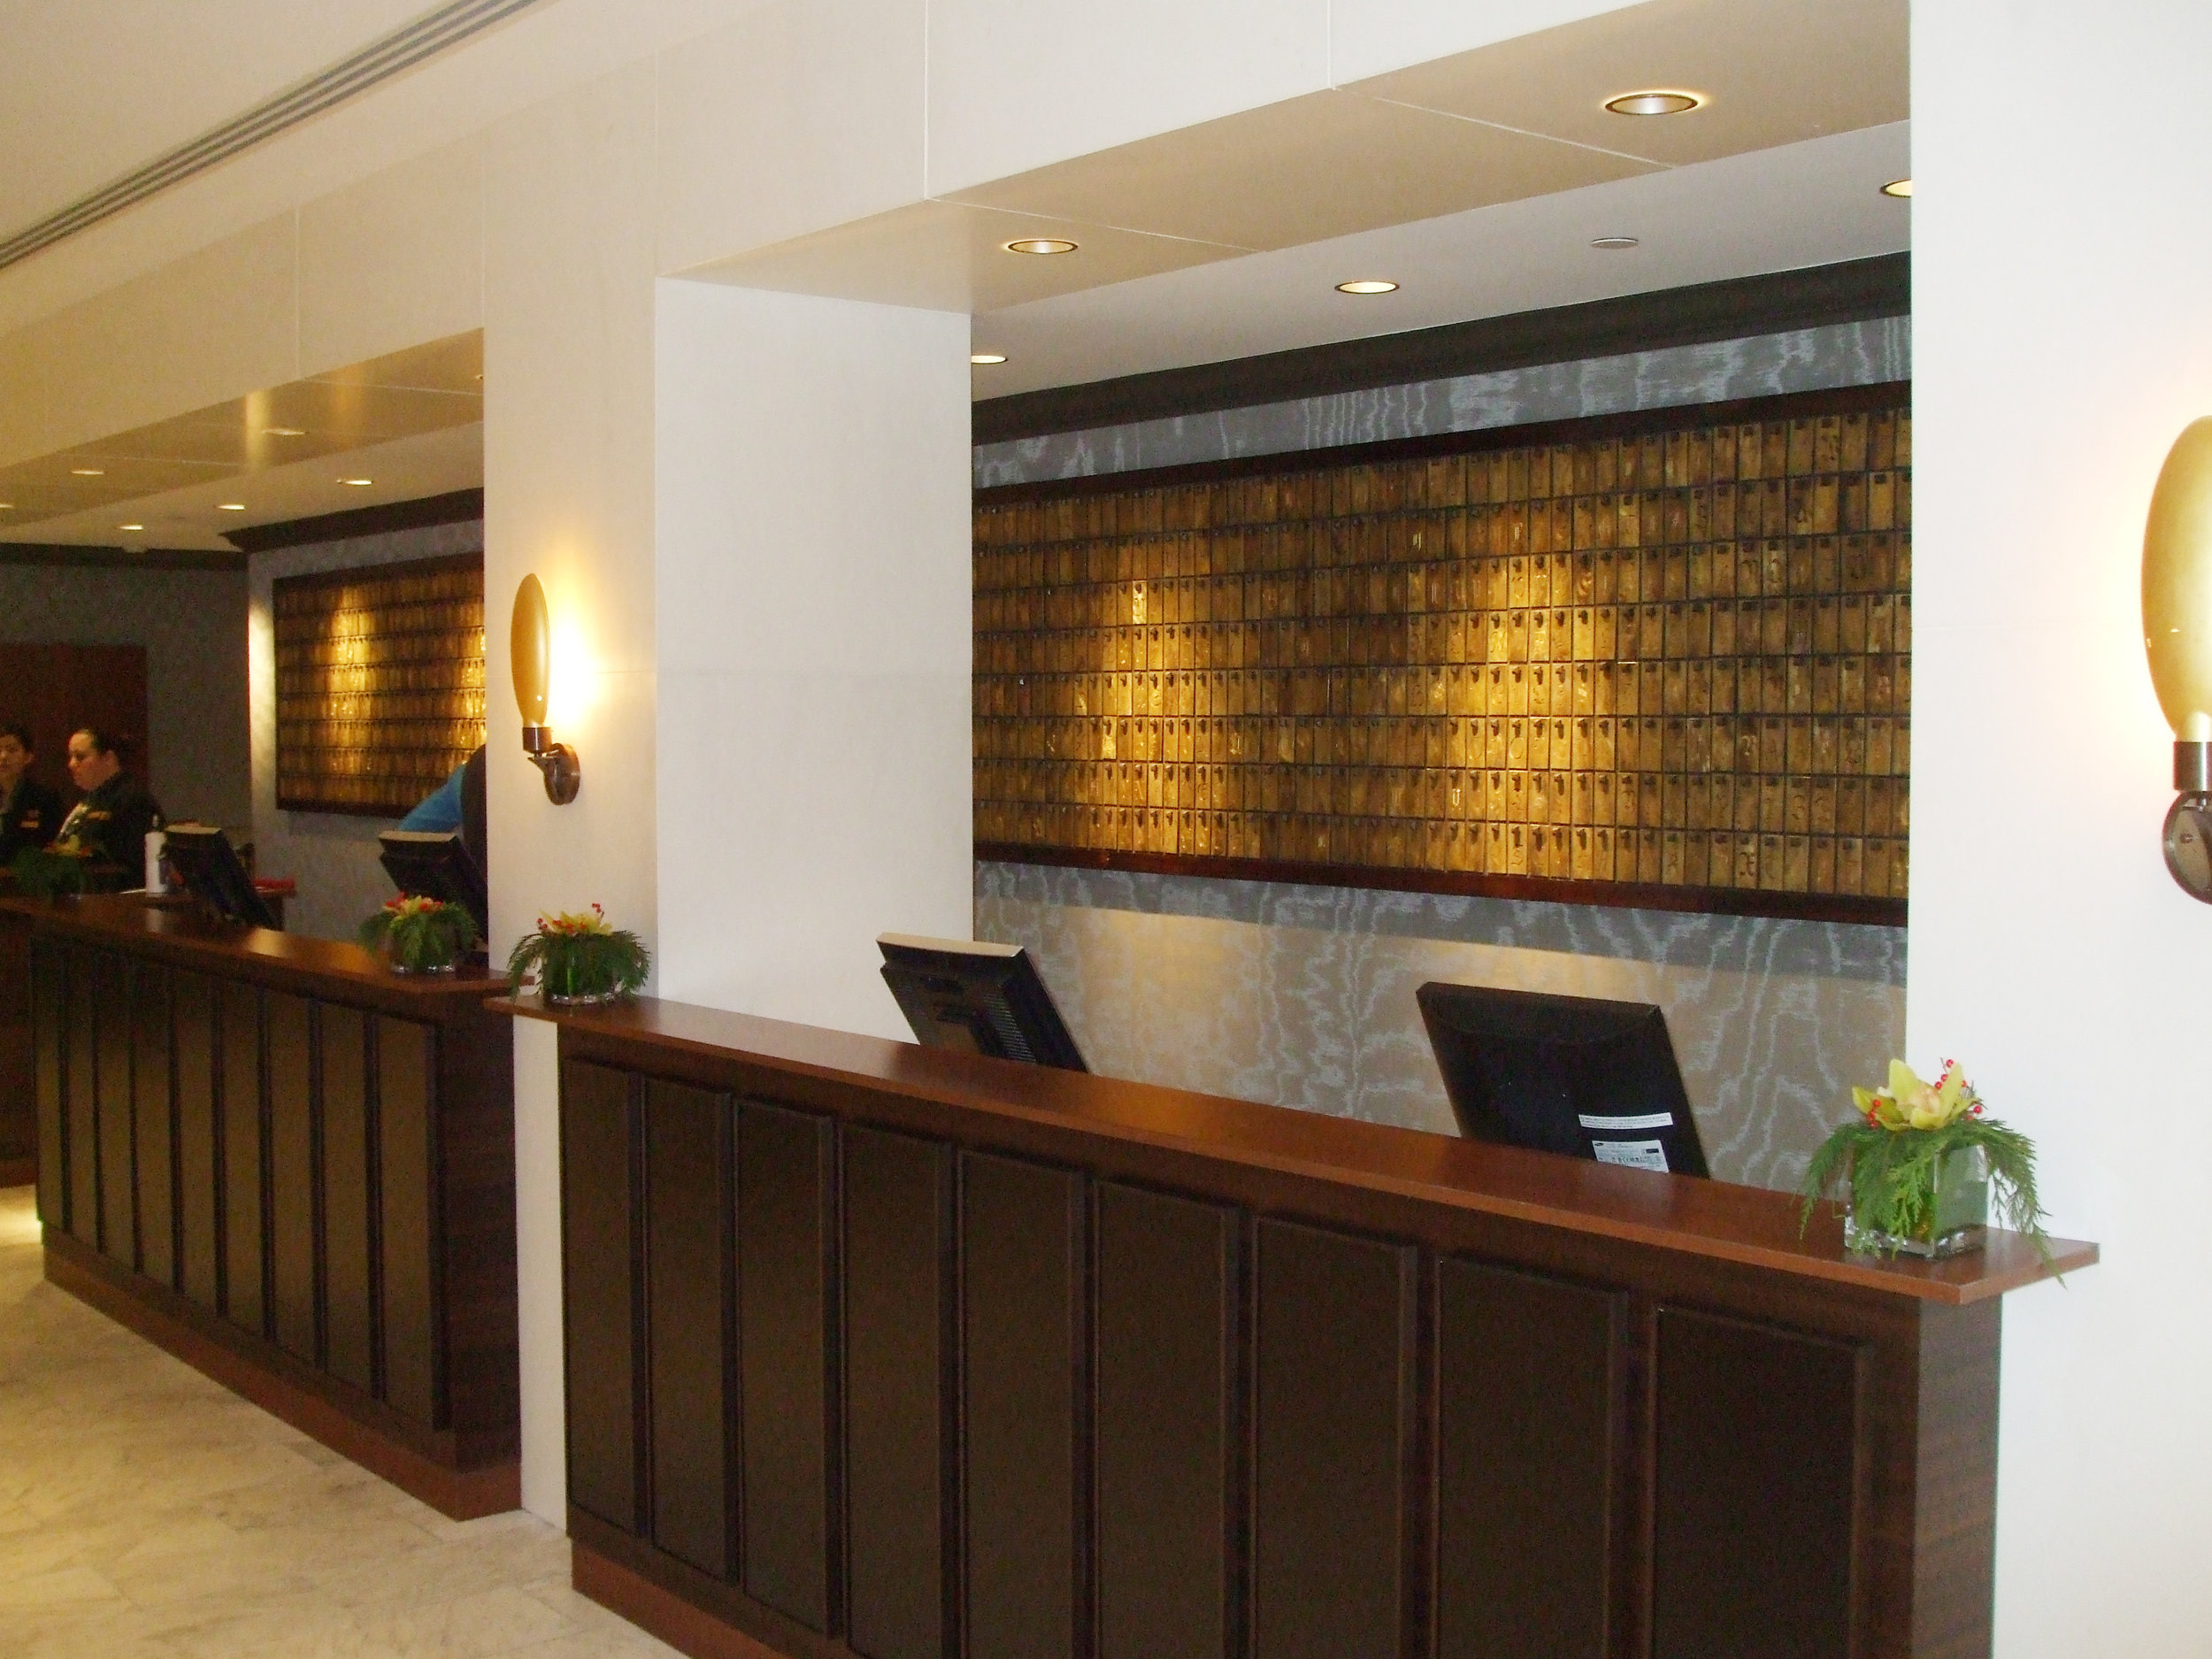 HVC-Lobby-Front Desk-DAC Art Piece-Art 100 copy (deleted 629c3ed88dc85dc90f609b048f696f42).JPG